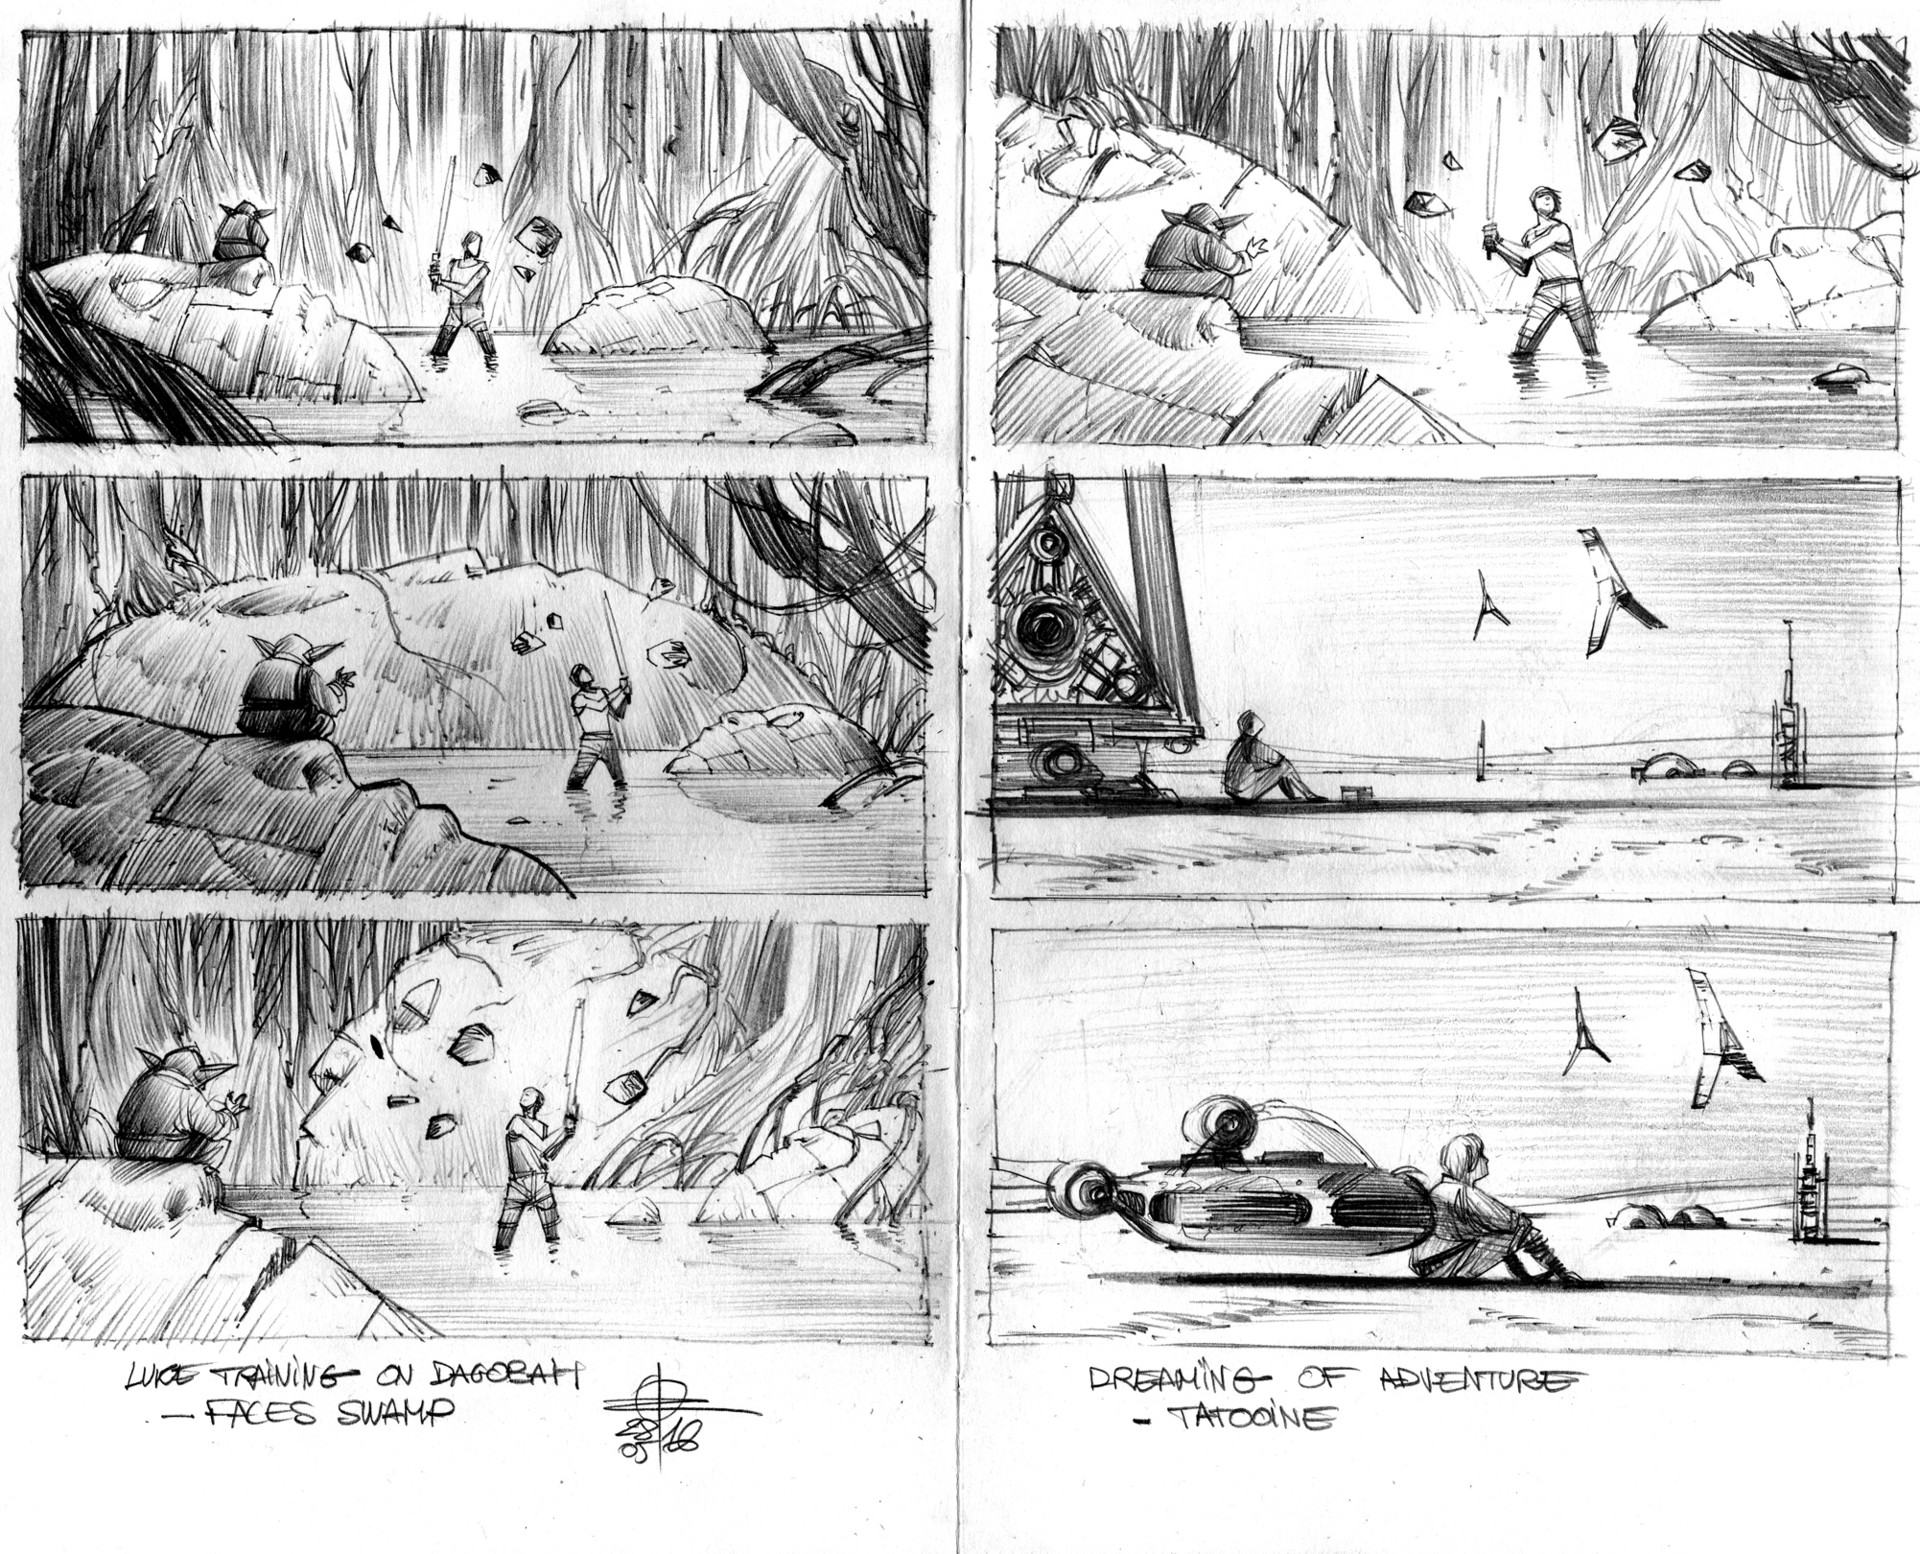 Renaud roche sketches04b